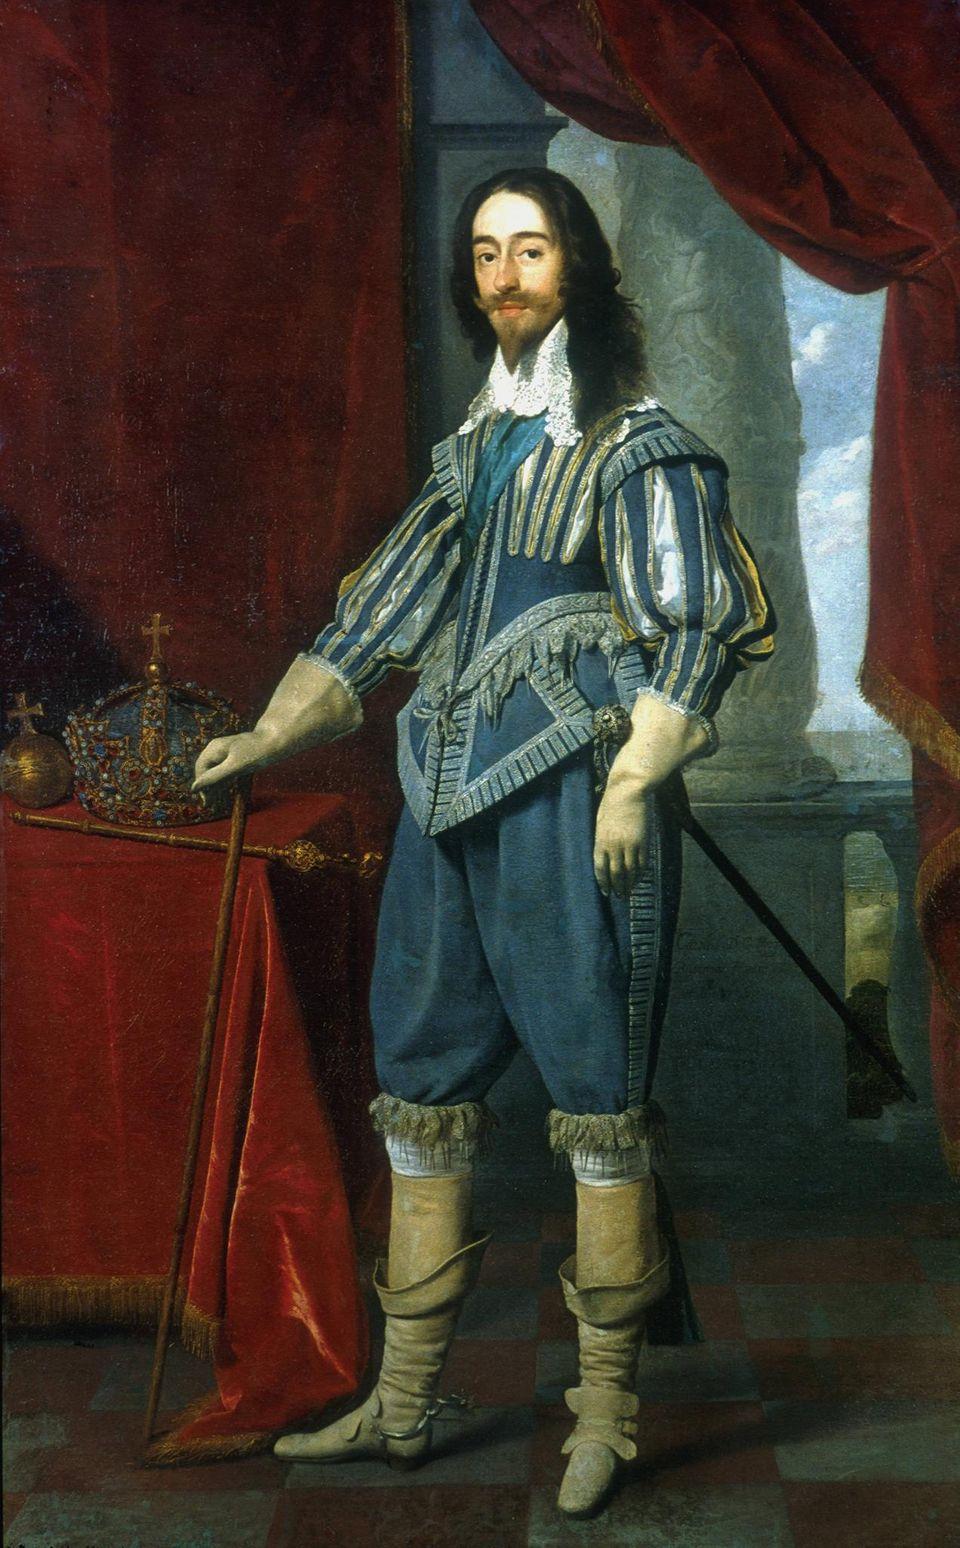 Charles I. wurde 1649 nach kurzem Prozess enthauptet